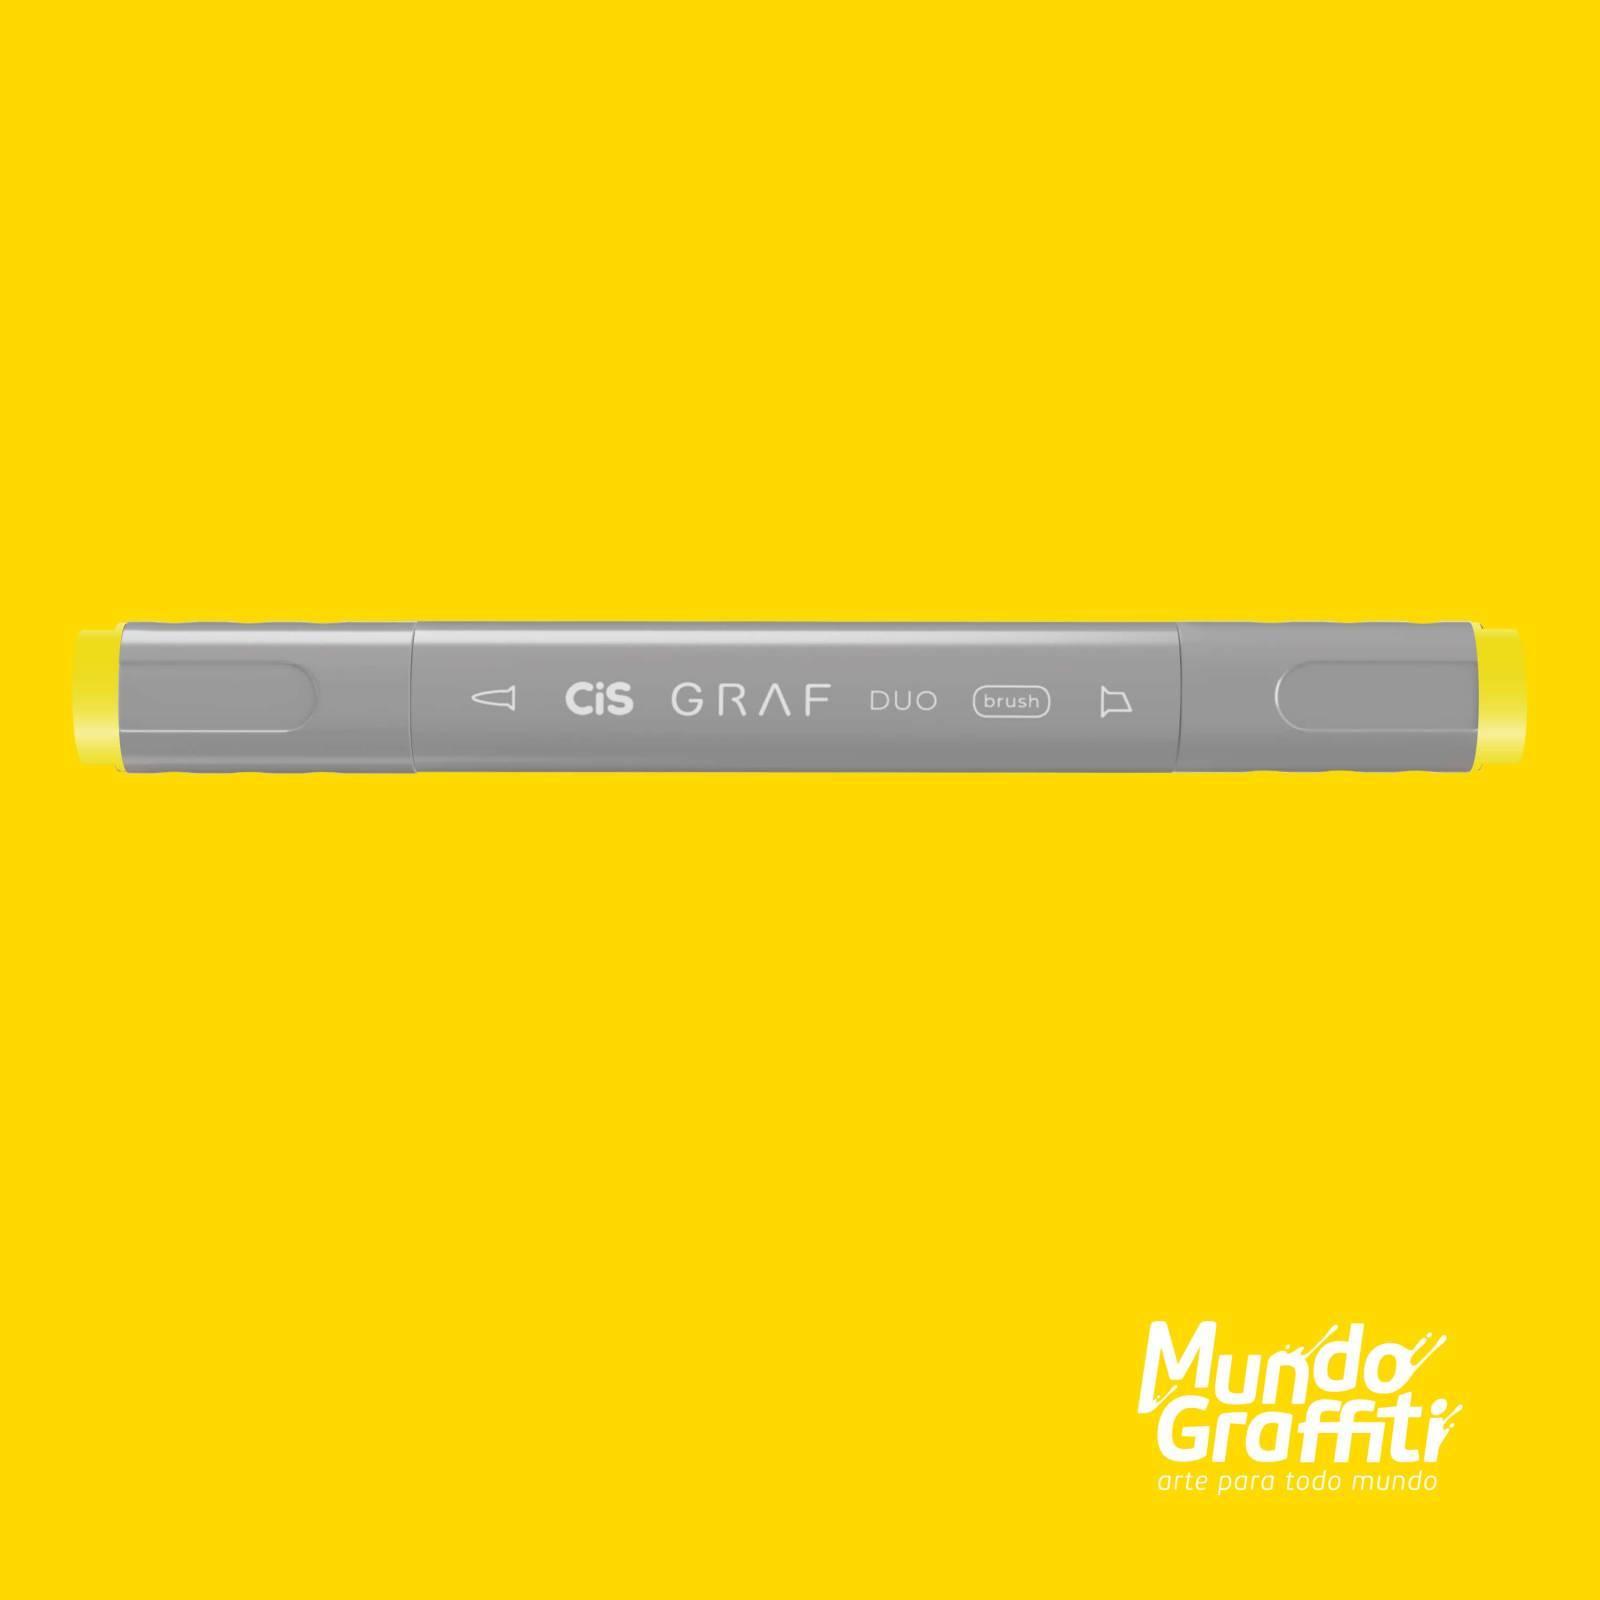 Marcador Cis Graf Duo Brush Lemon Yellow 35 - Mundo Graffiti